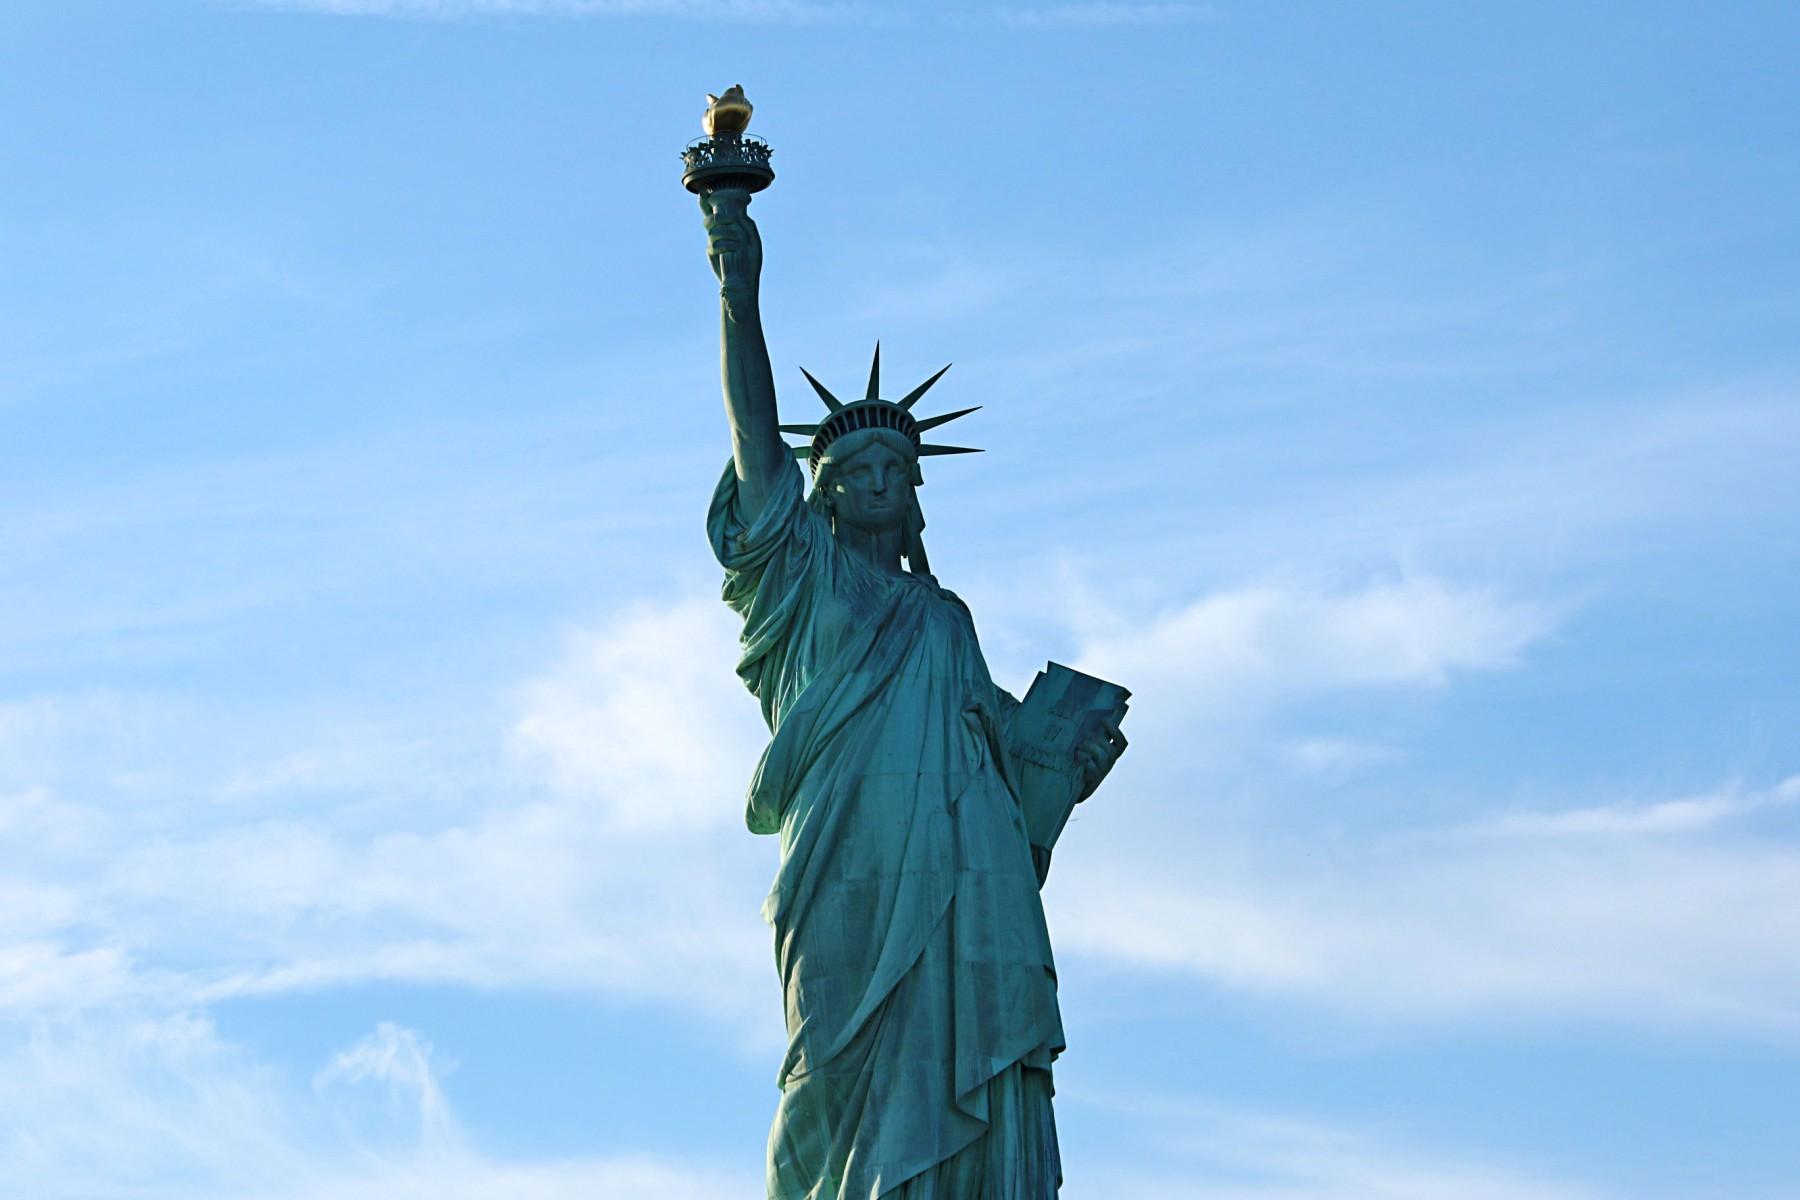 New York, Freiheitsstatue, Statue of Liberty